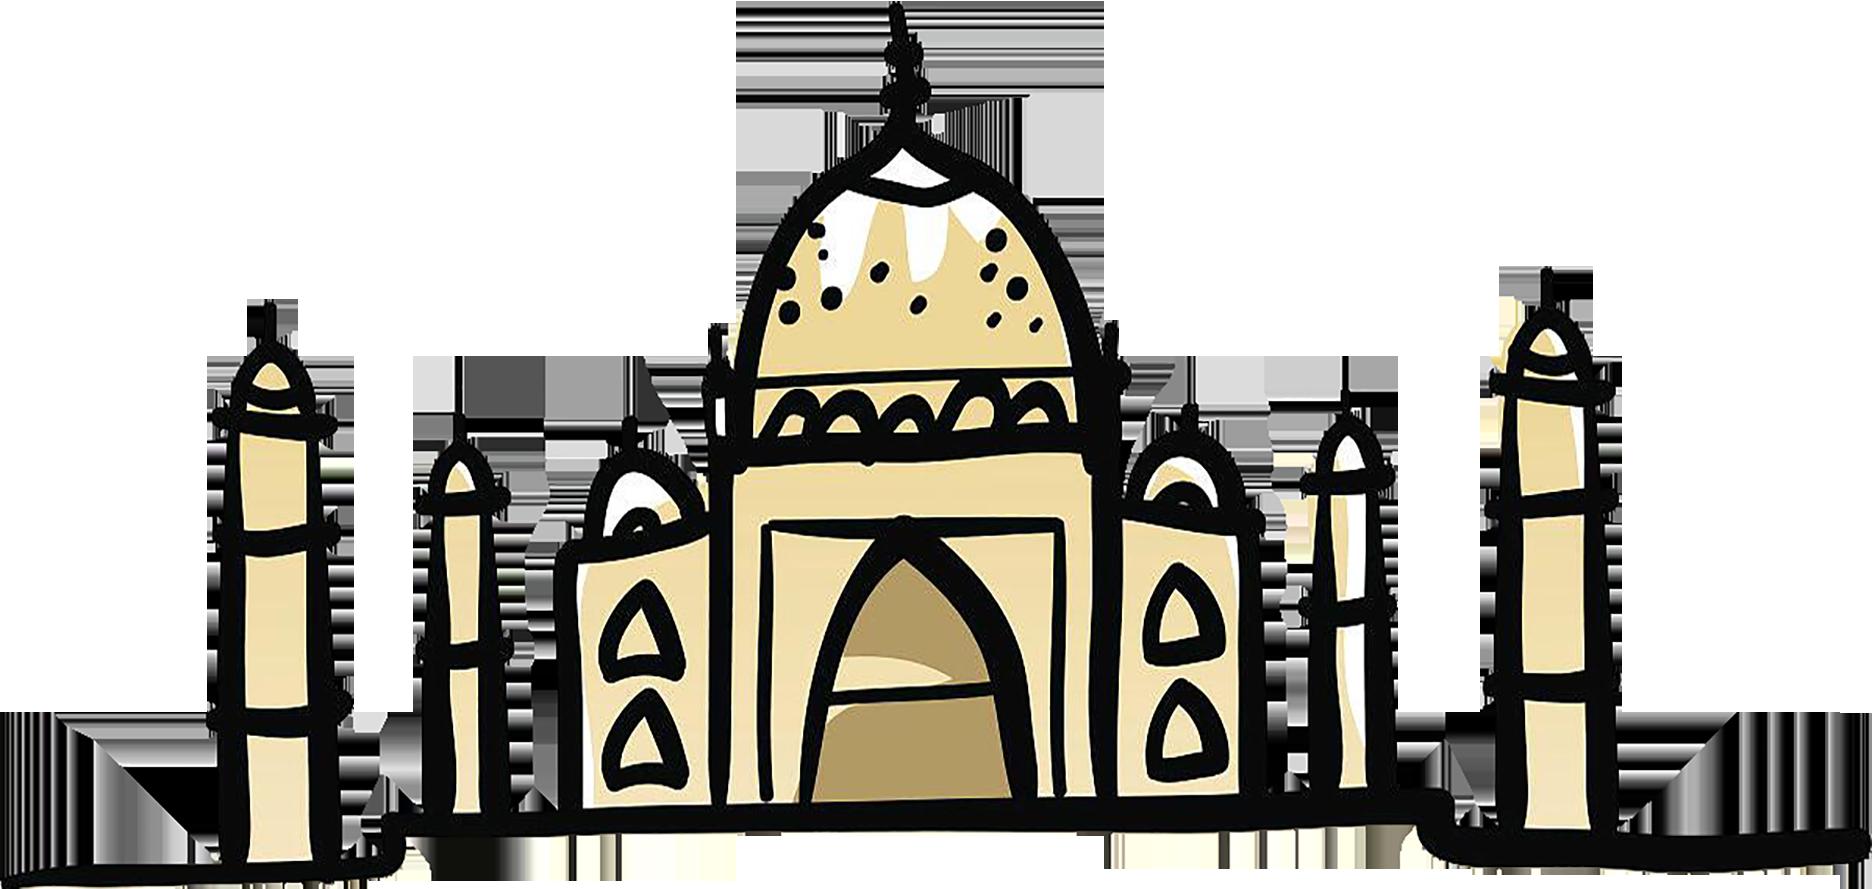 banner freeuse stock Taj mahal grave illustration. Mosque drawing cartoon